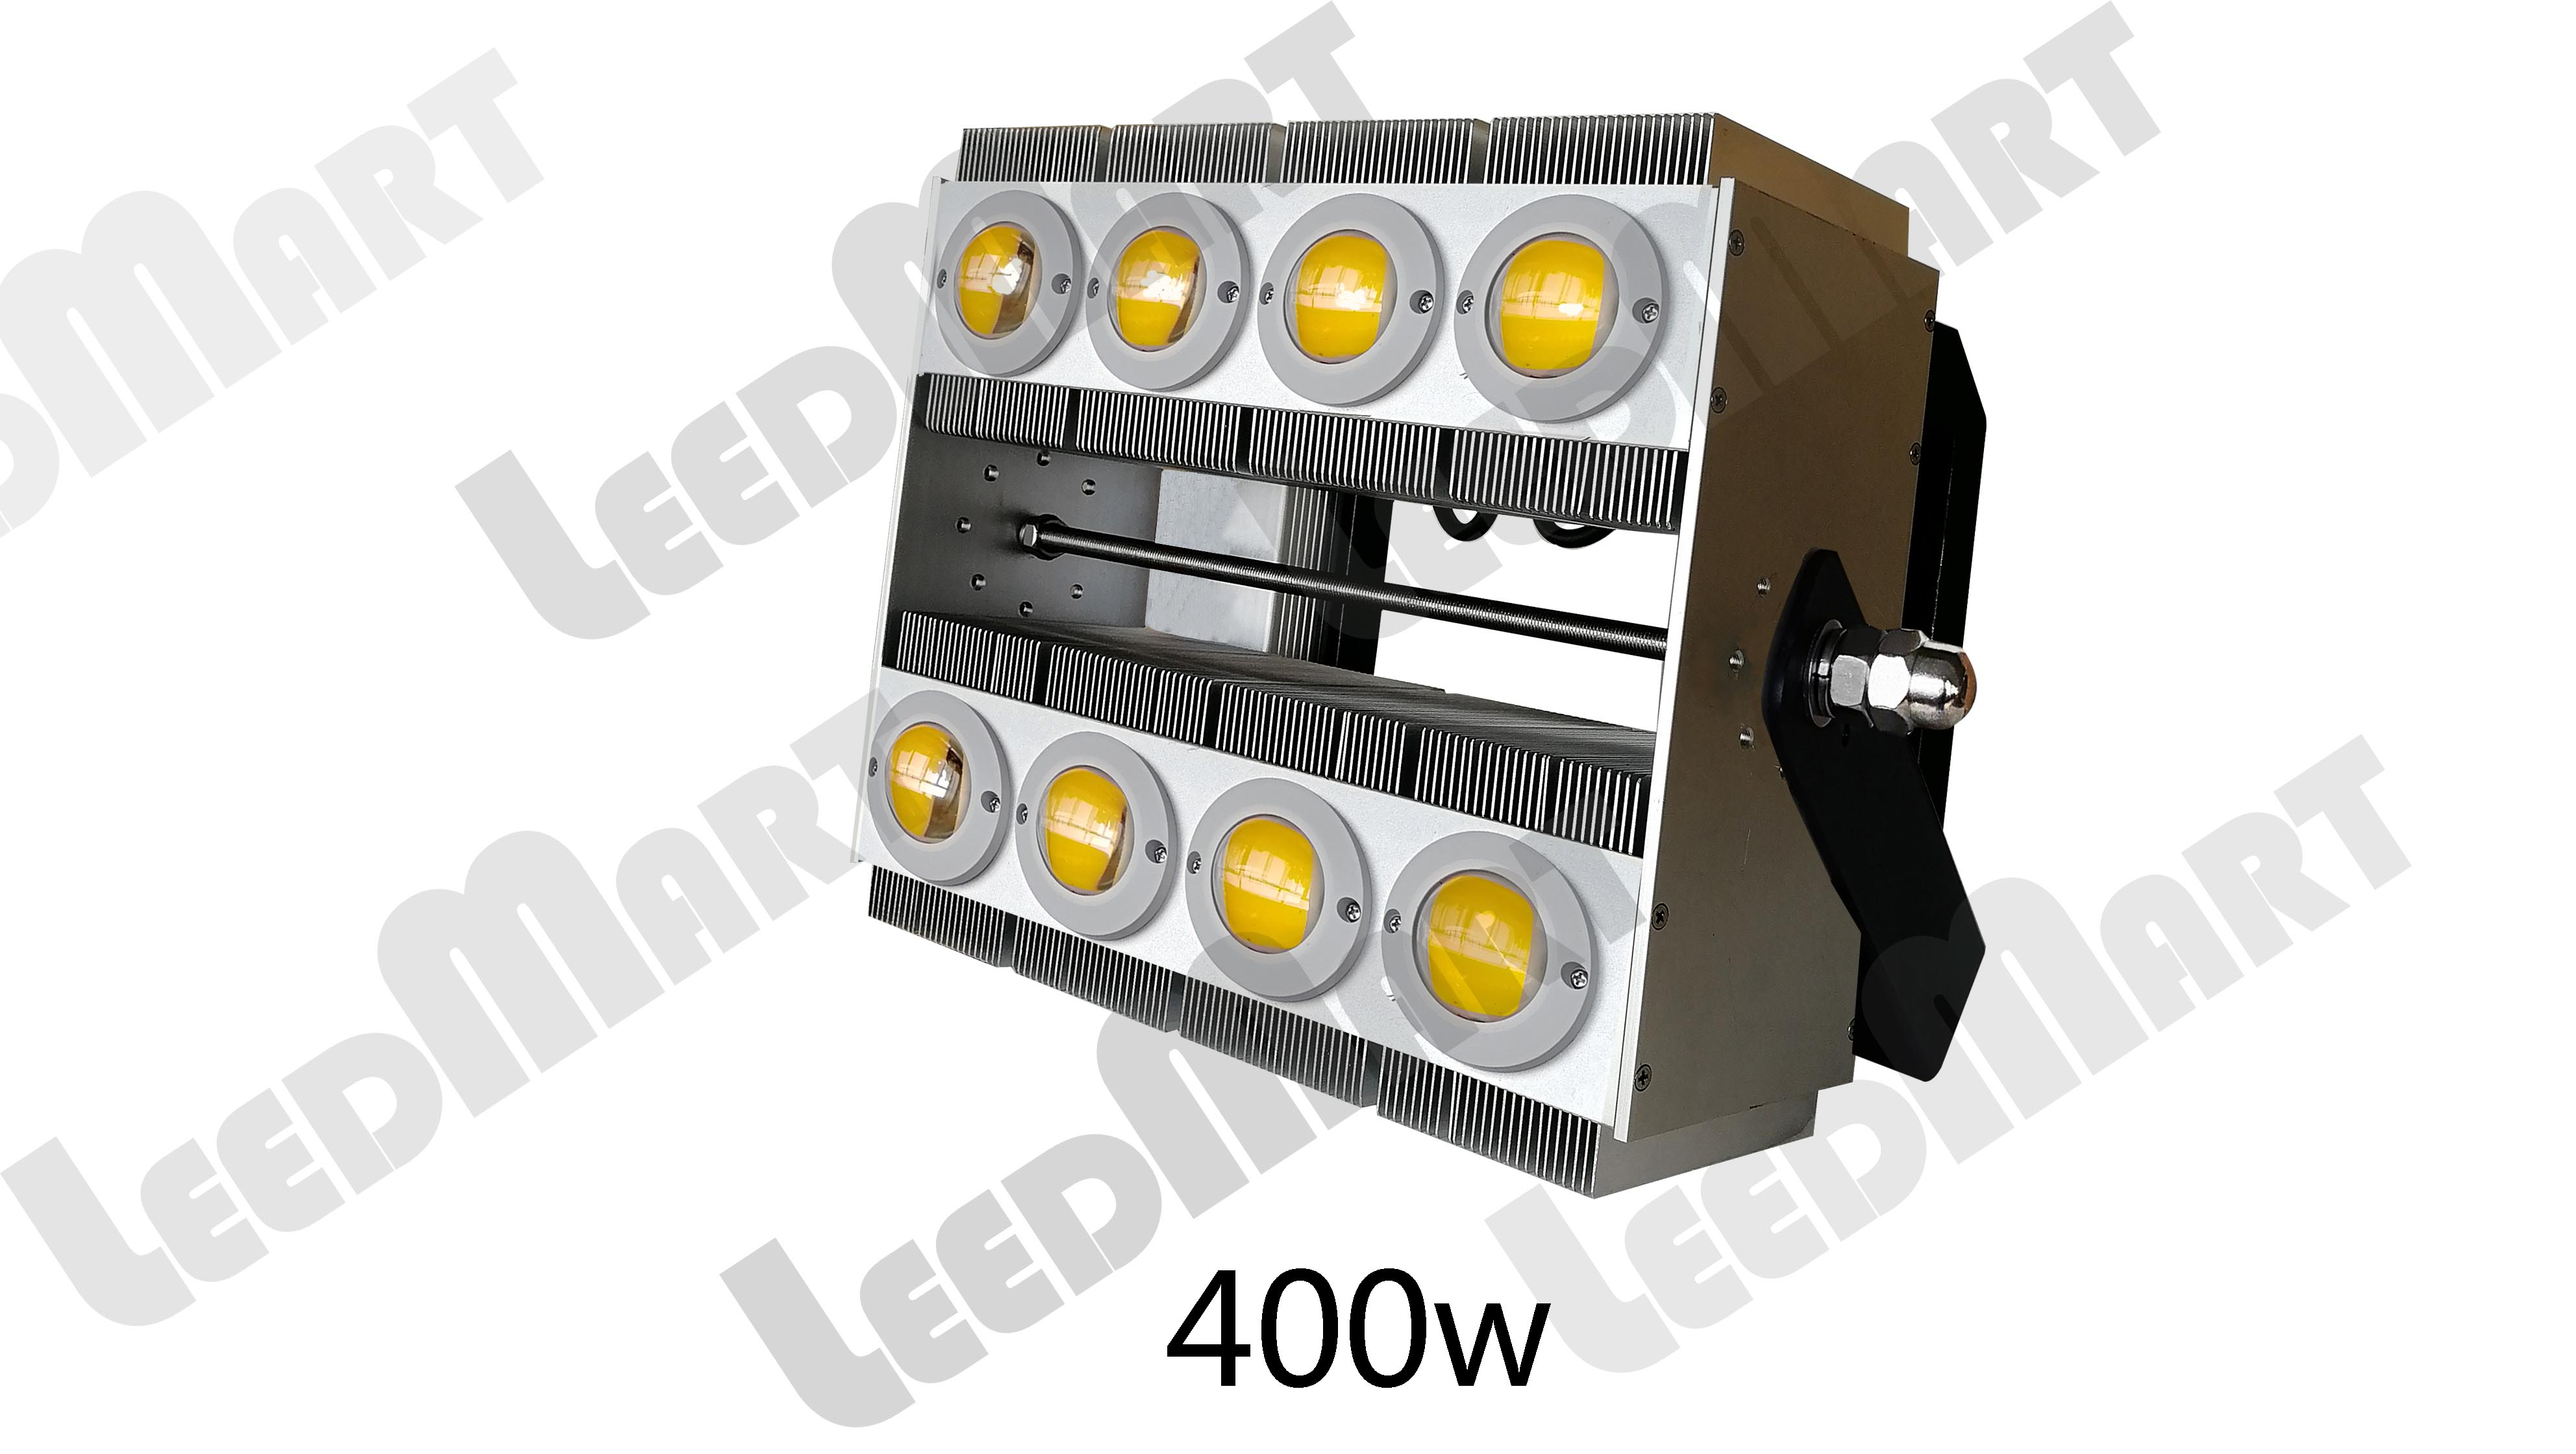 Good quality IP65 100 watt -1000 watt 130000 lumen LED high mast light fixture windproof design